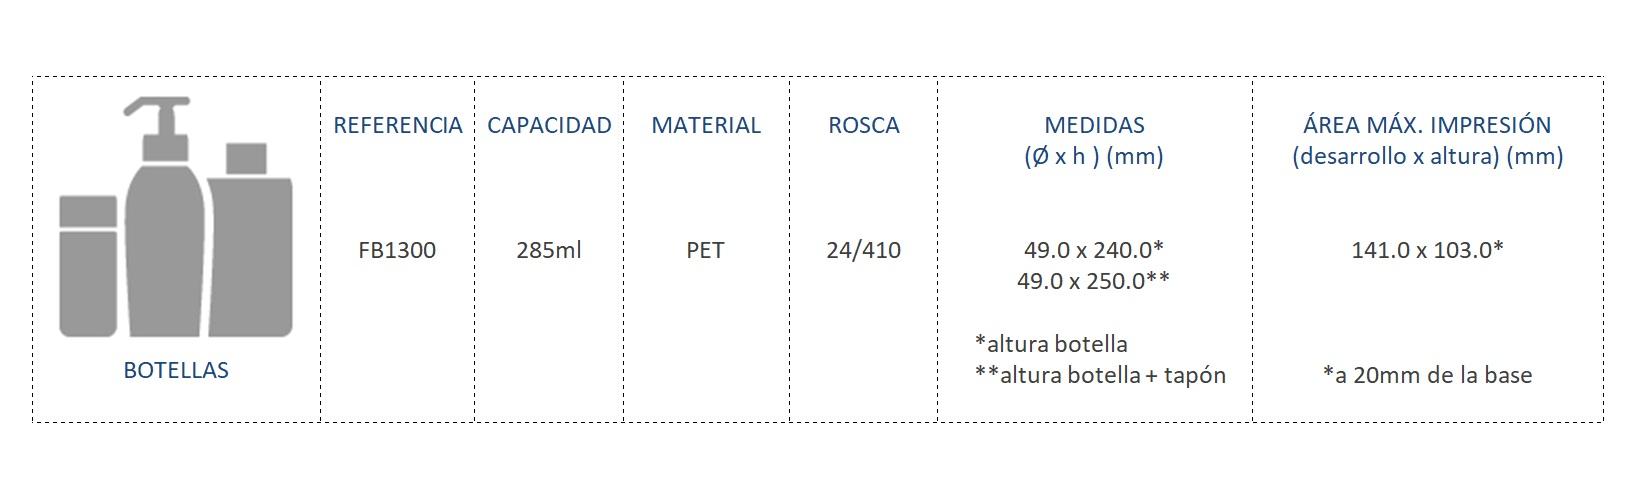 Cuadro de materiales botella FB1300